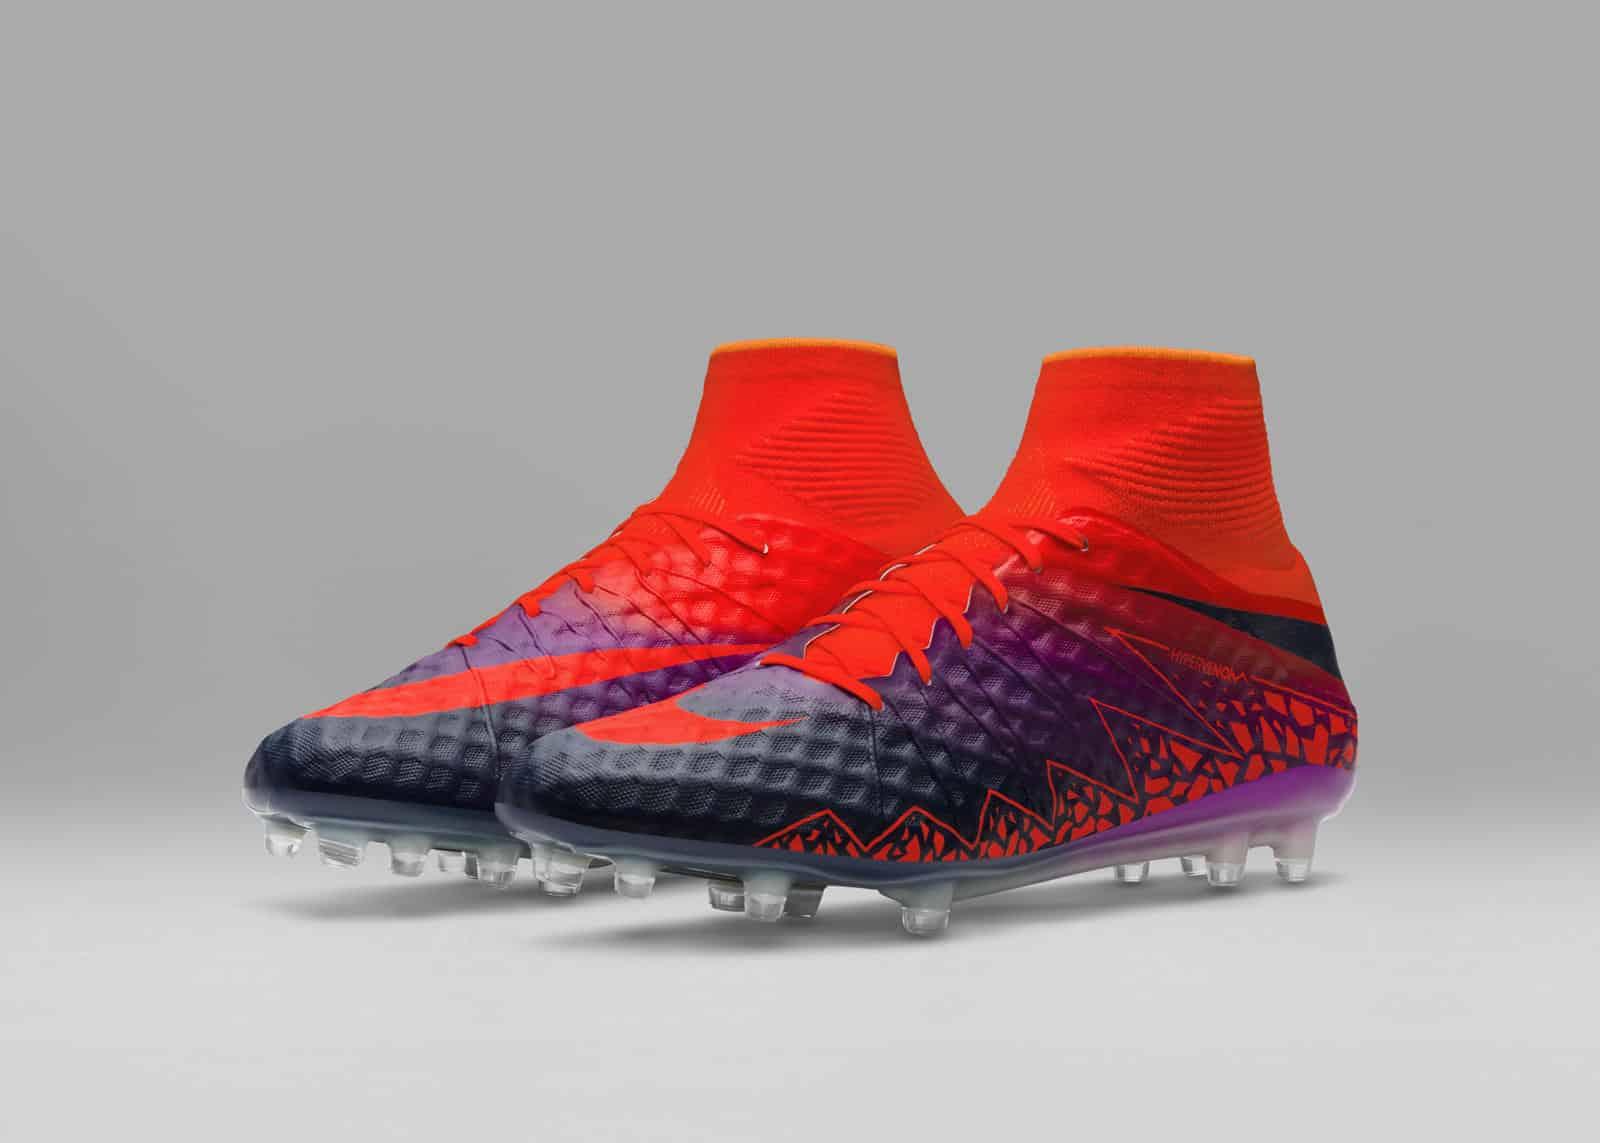 new styles a66ac 5f7b7 Acheter Hypervenom Et Futsal Nike Authentique Chaussure Vendre BvqYrB